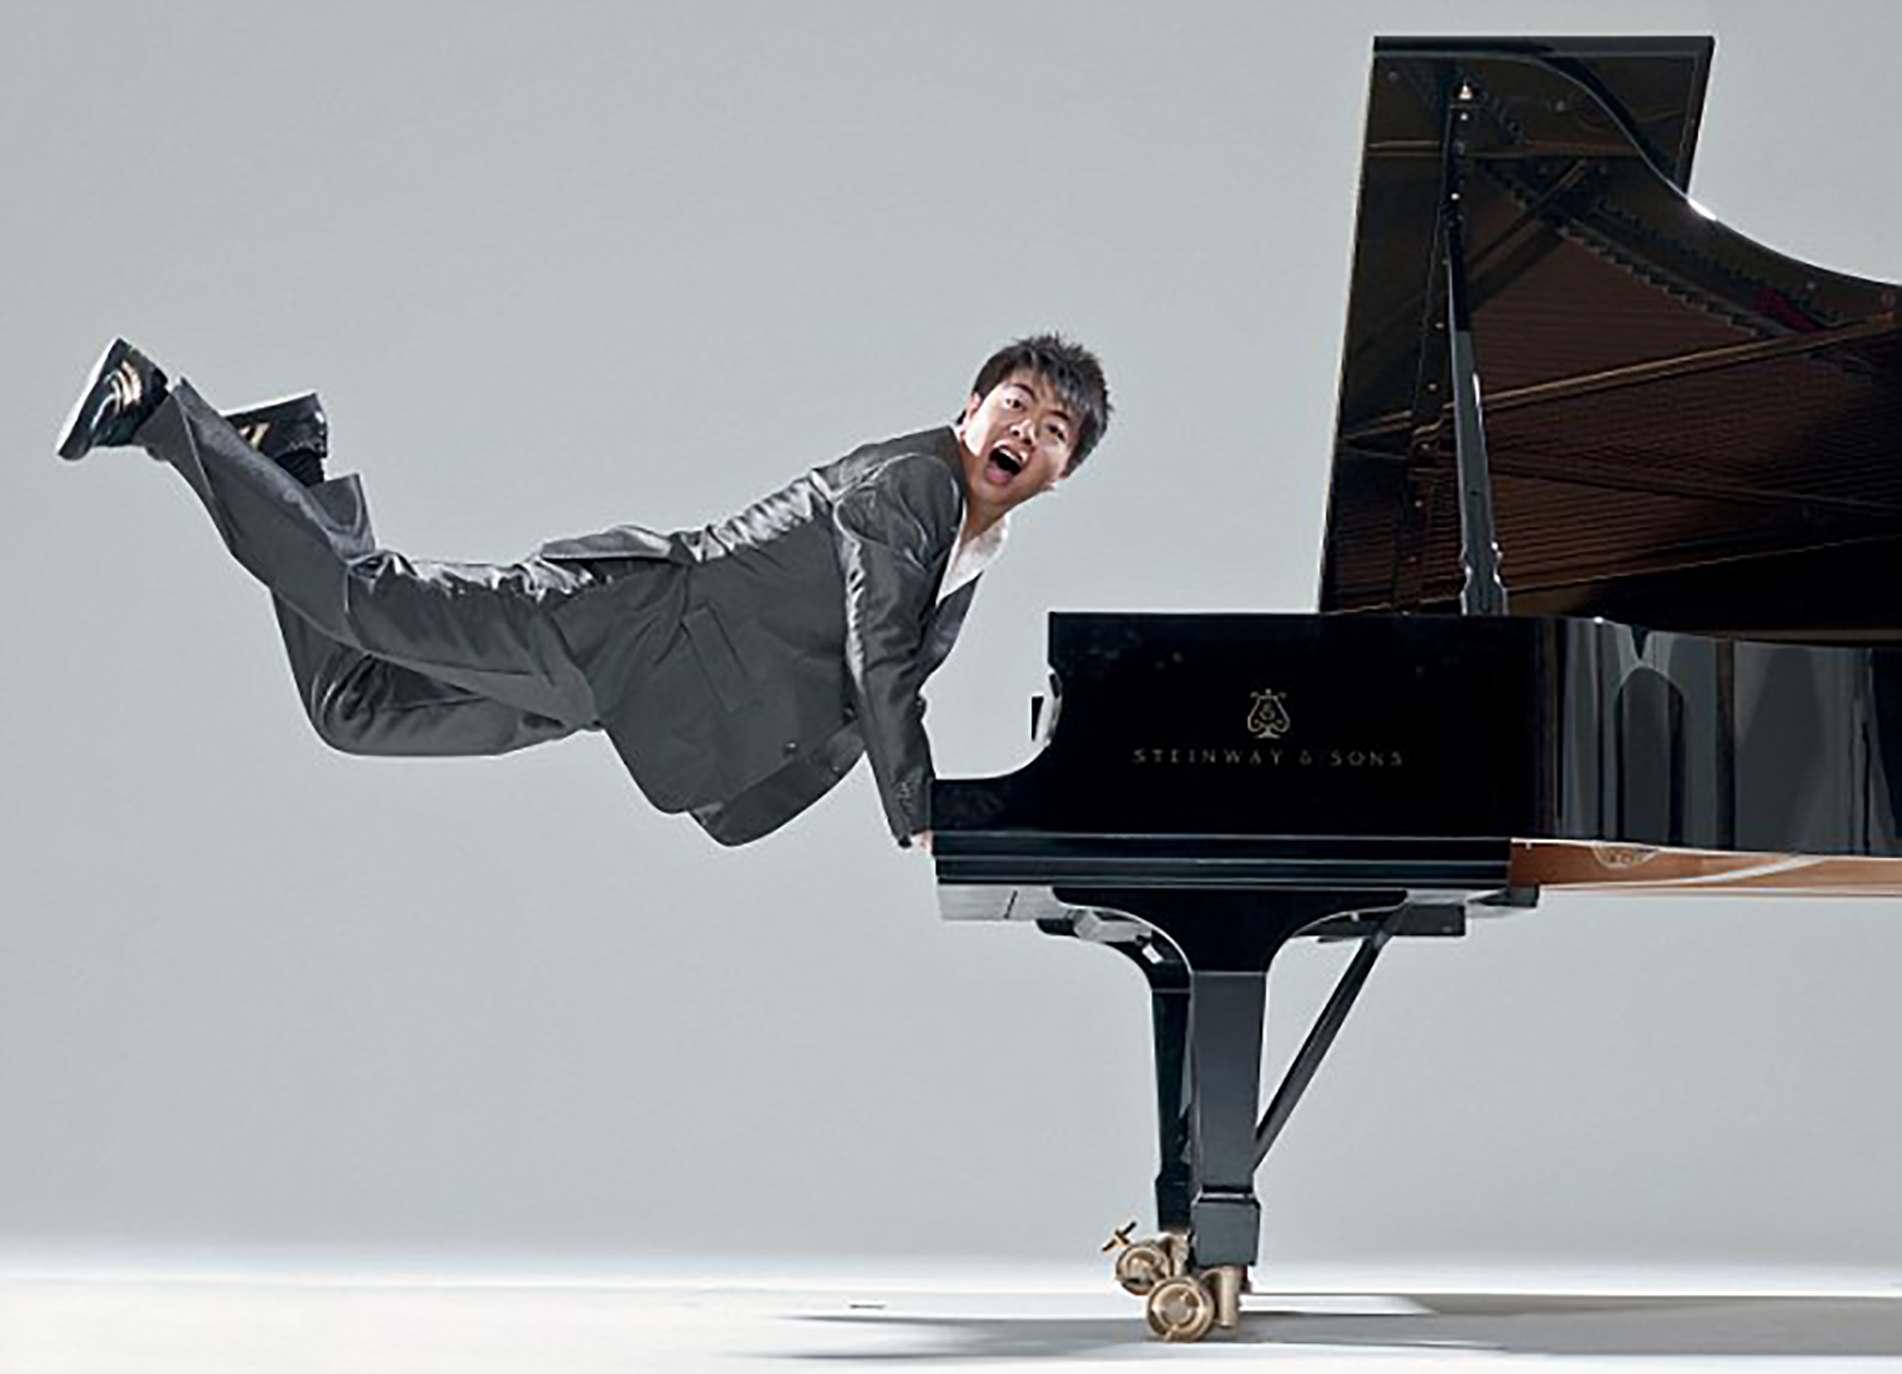 hoc-piano-co-can-nang-khieu-khong